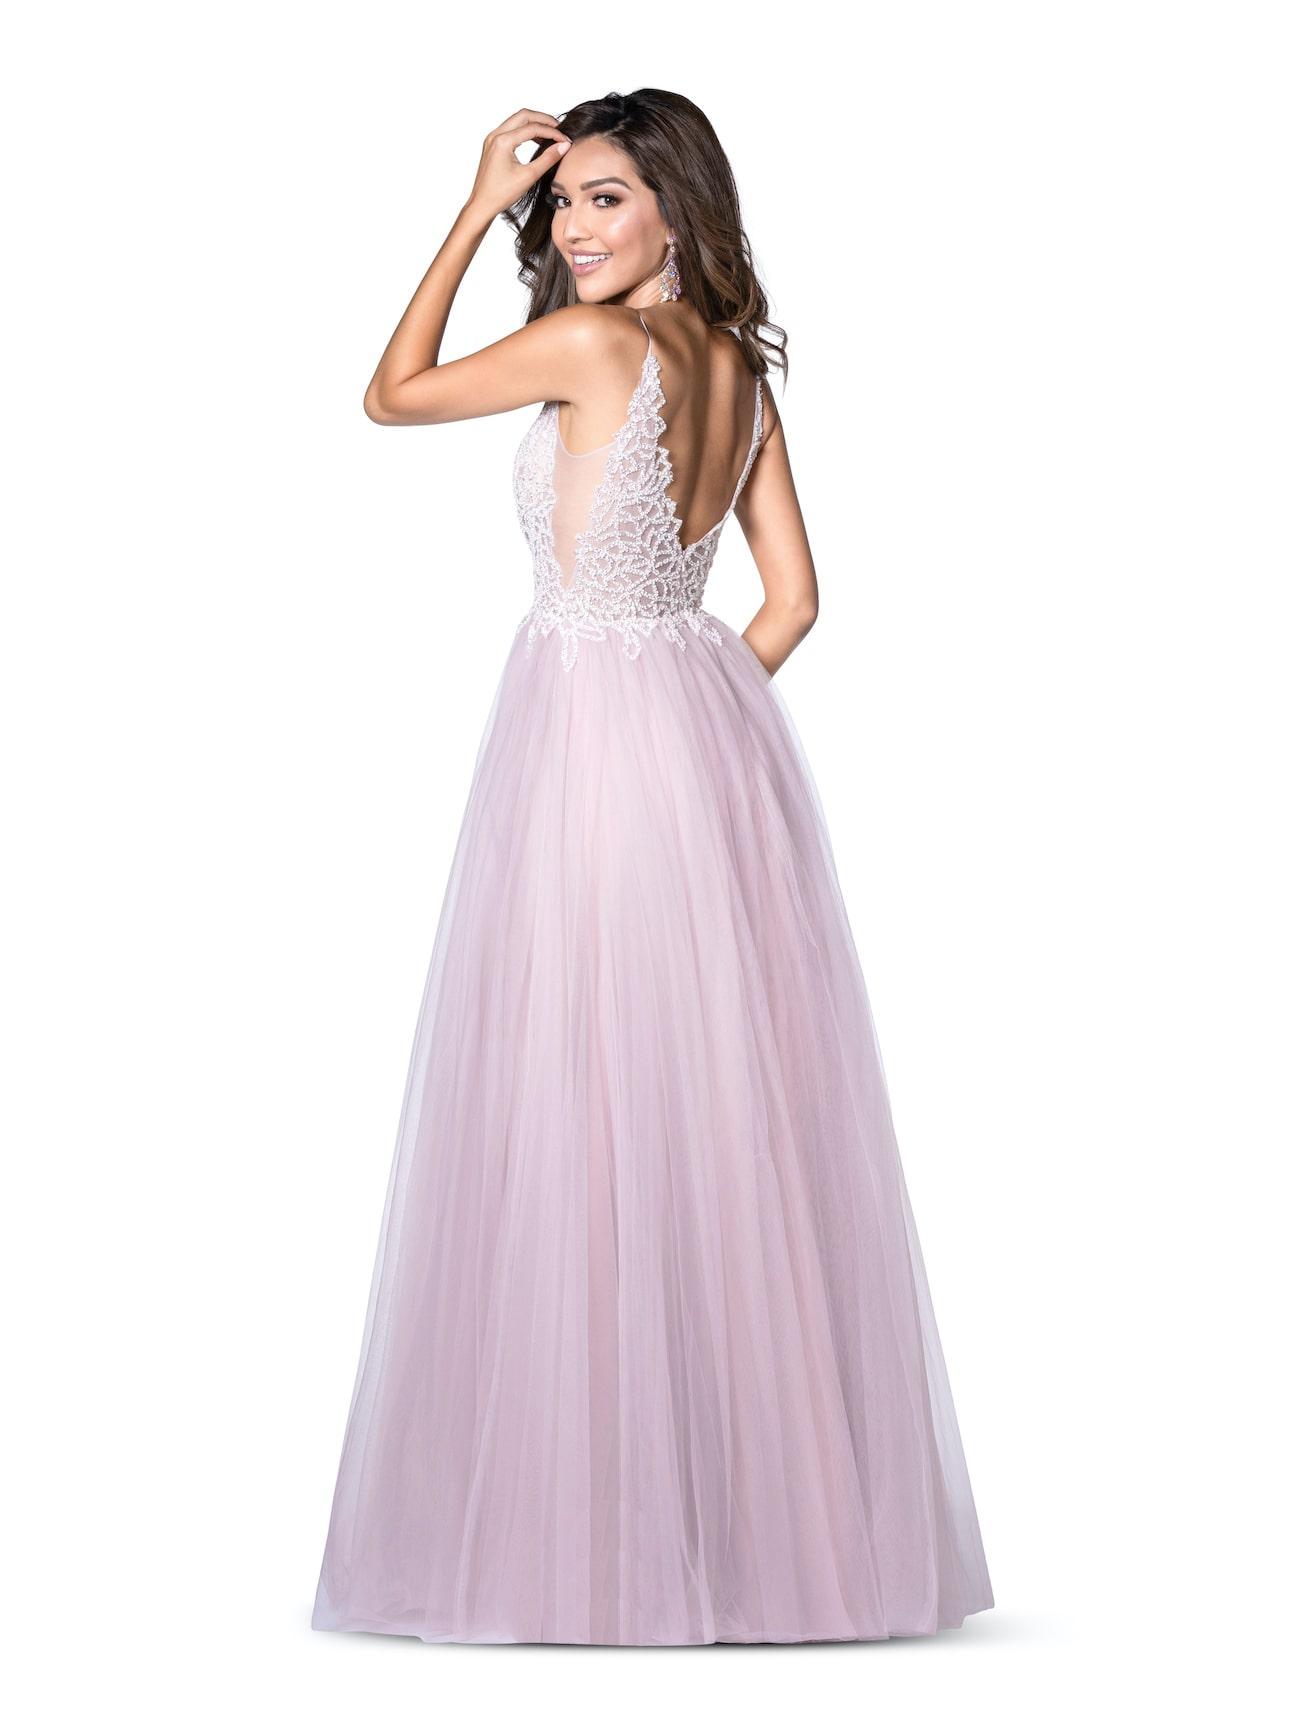 Vienna Light Blue Size 16 A-line Backless Side slit Dress on Queenly